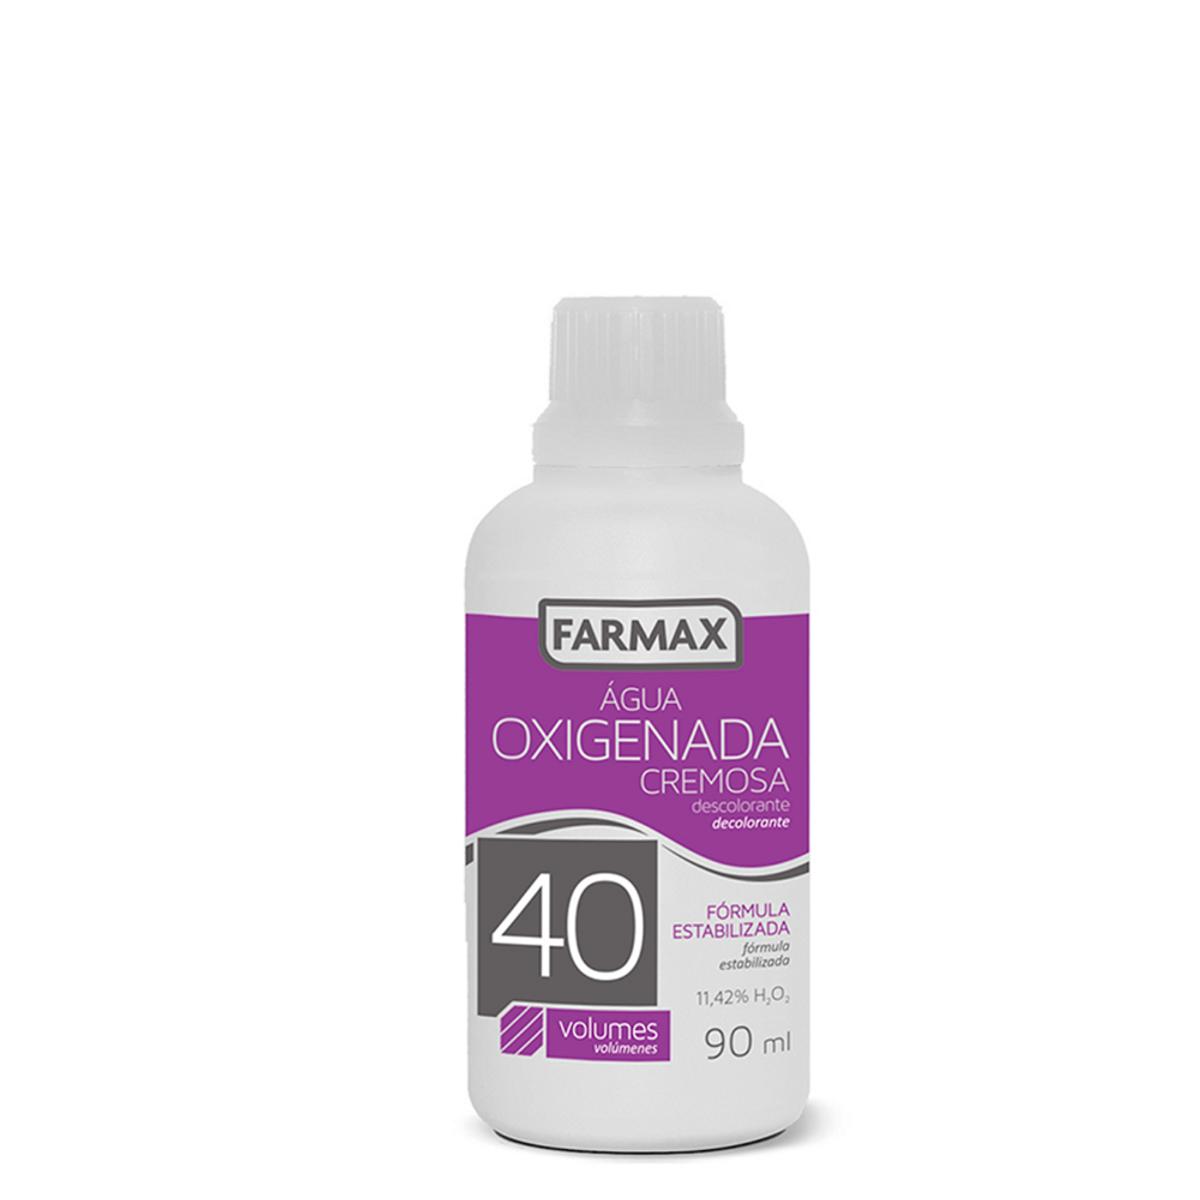 Água Oxigenada Cremosa 40 volumes - 90 ml (Farmax)